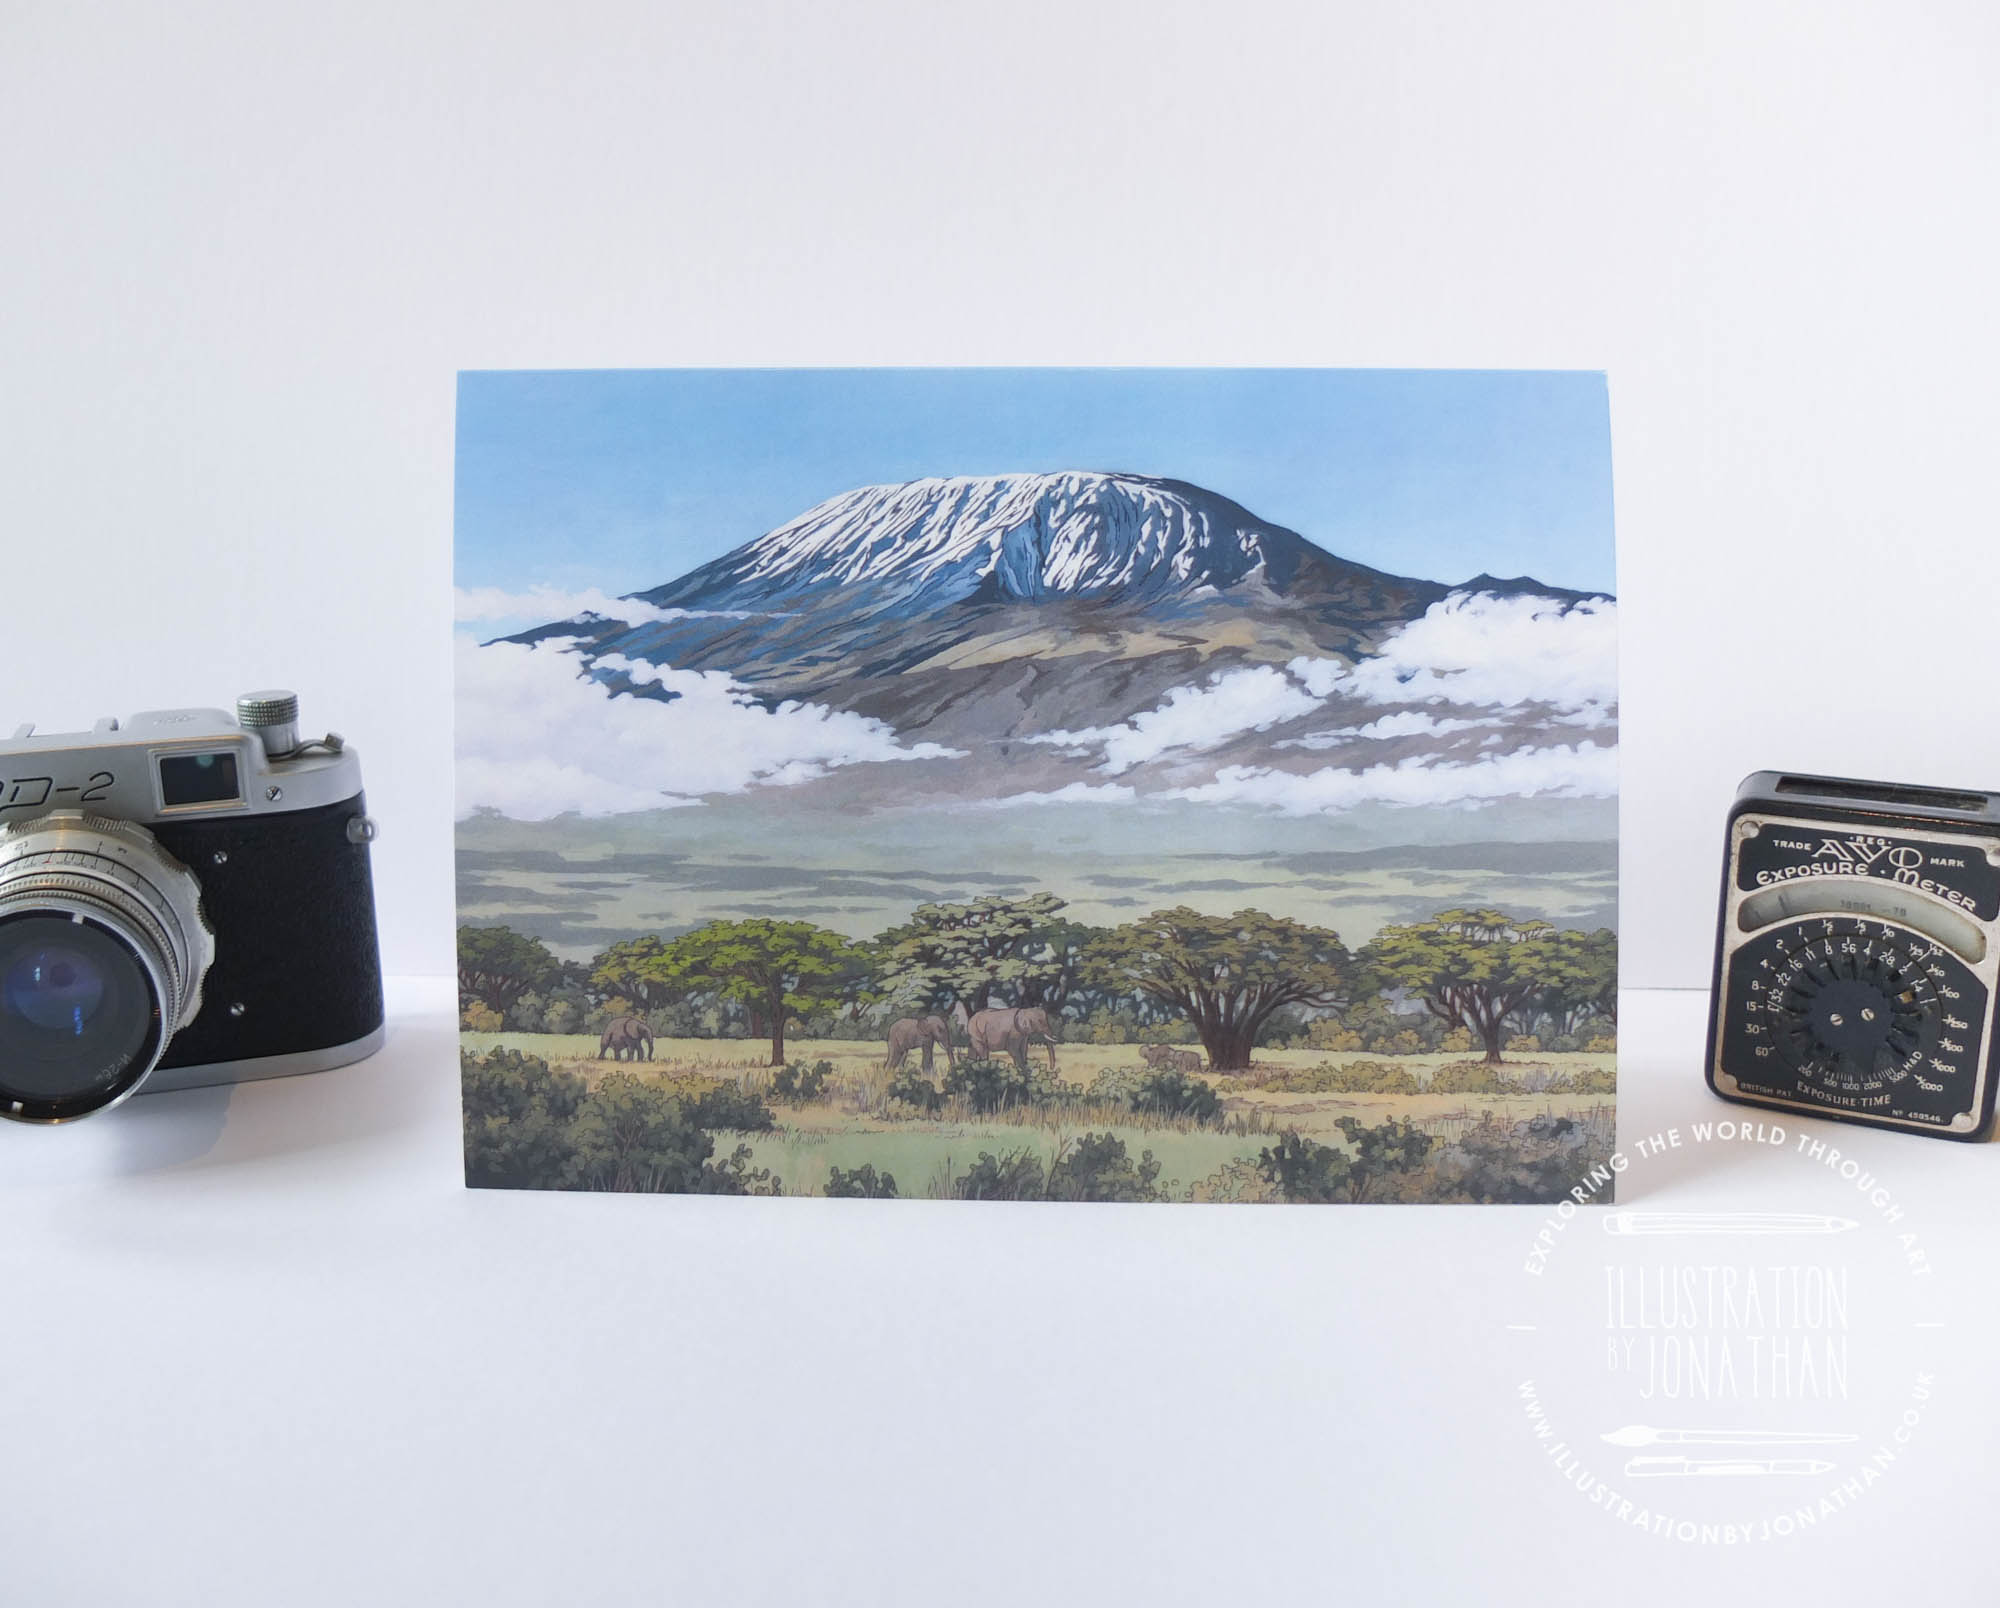 Mount Kilimanjaro Greeting Card - Illustration by Jonathan Chapman